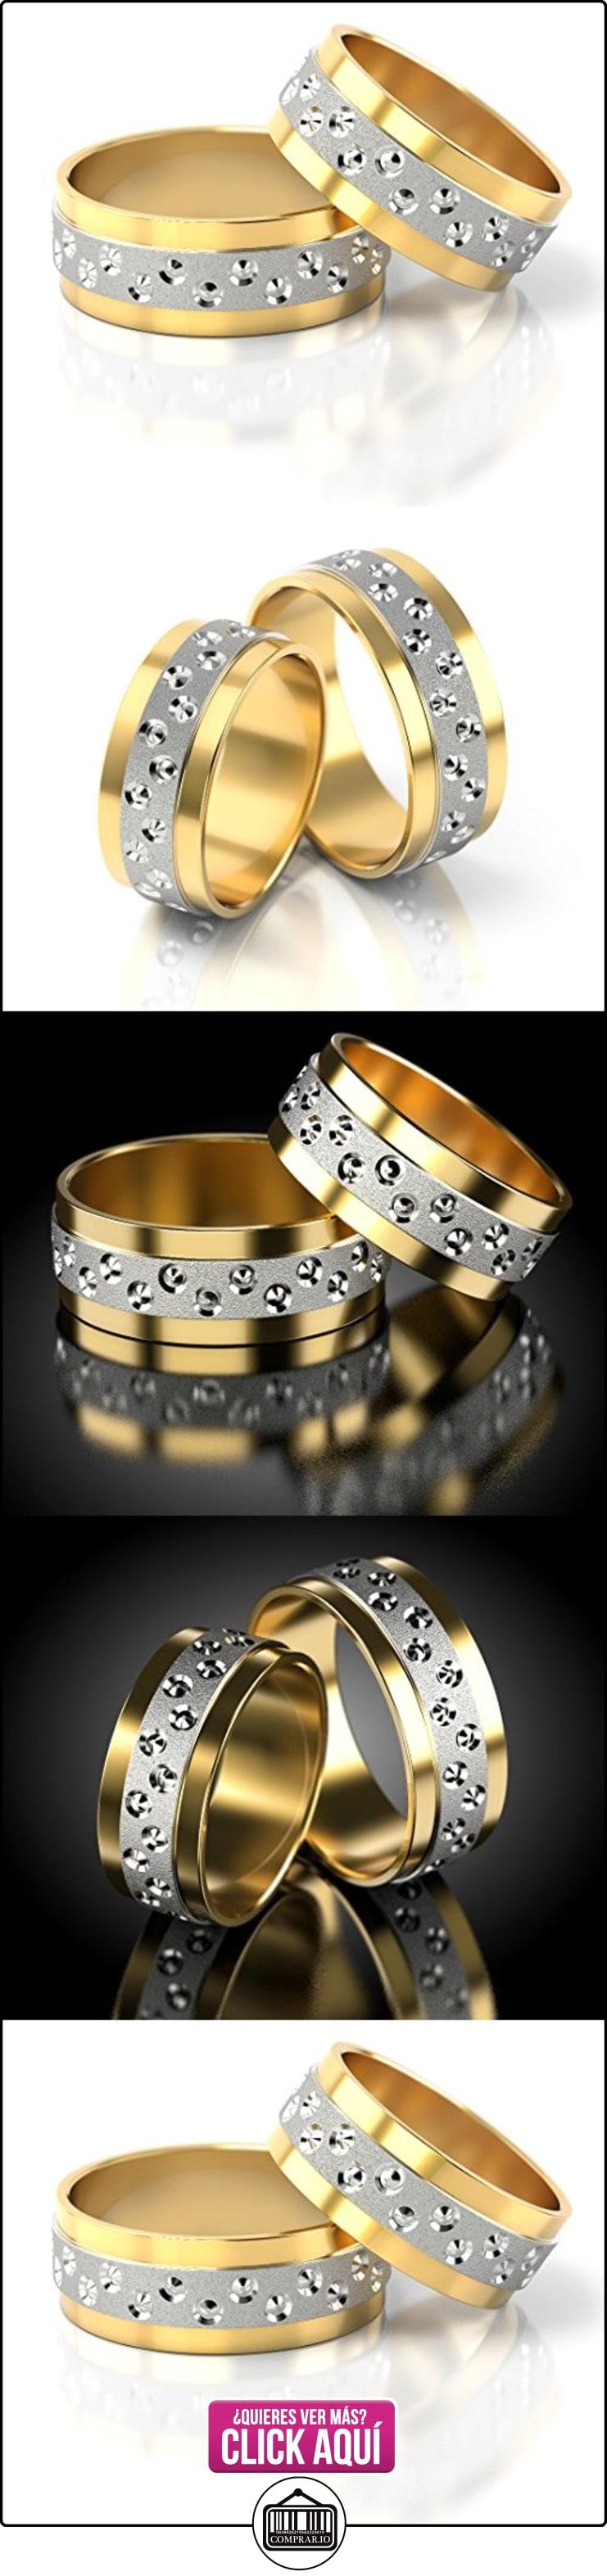 Anillos De Boda Oro Blanco / Oro amarillo 750_PD155_S-851  ✿ Joyas para hombres especiales - lujo ✿ ▬► Ver oferta: http://comprar.io/goto/B01DOQ02H2